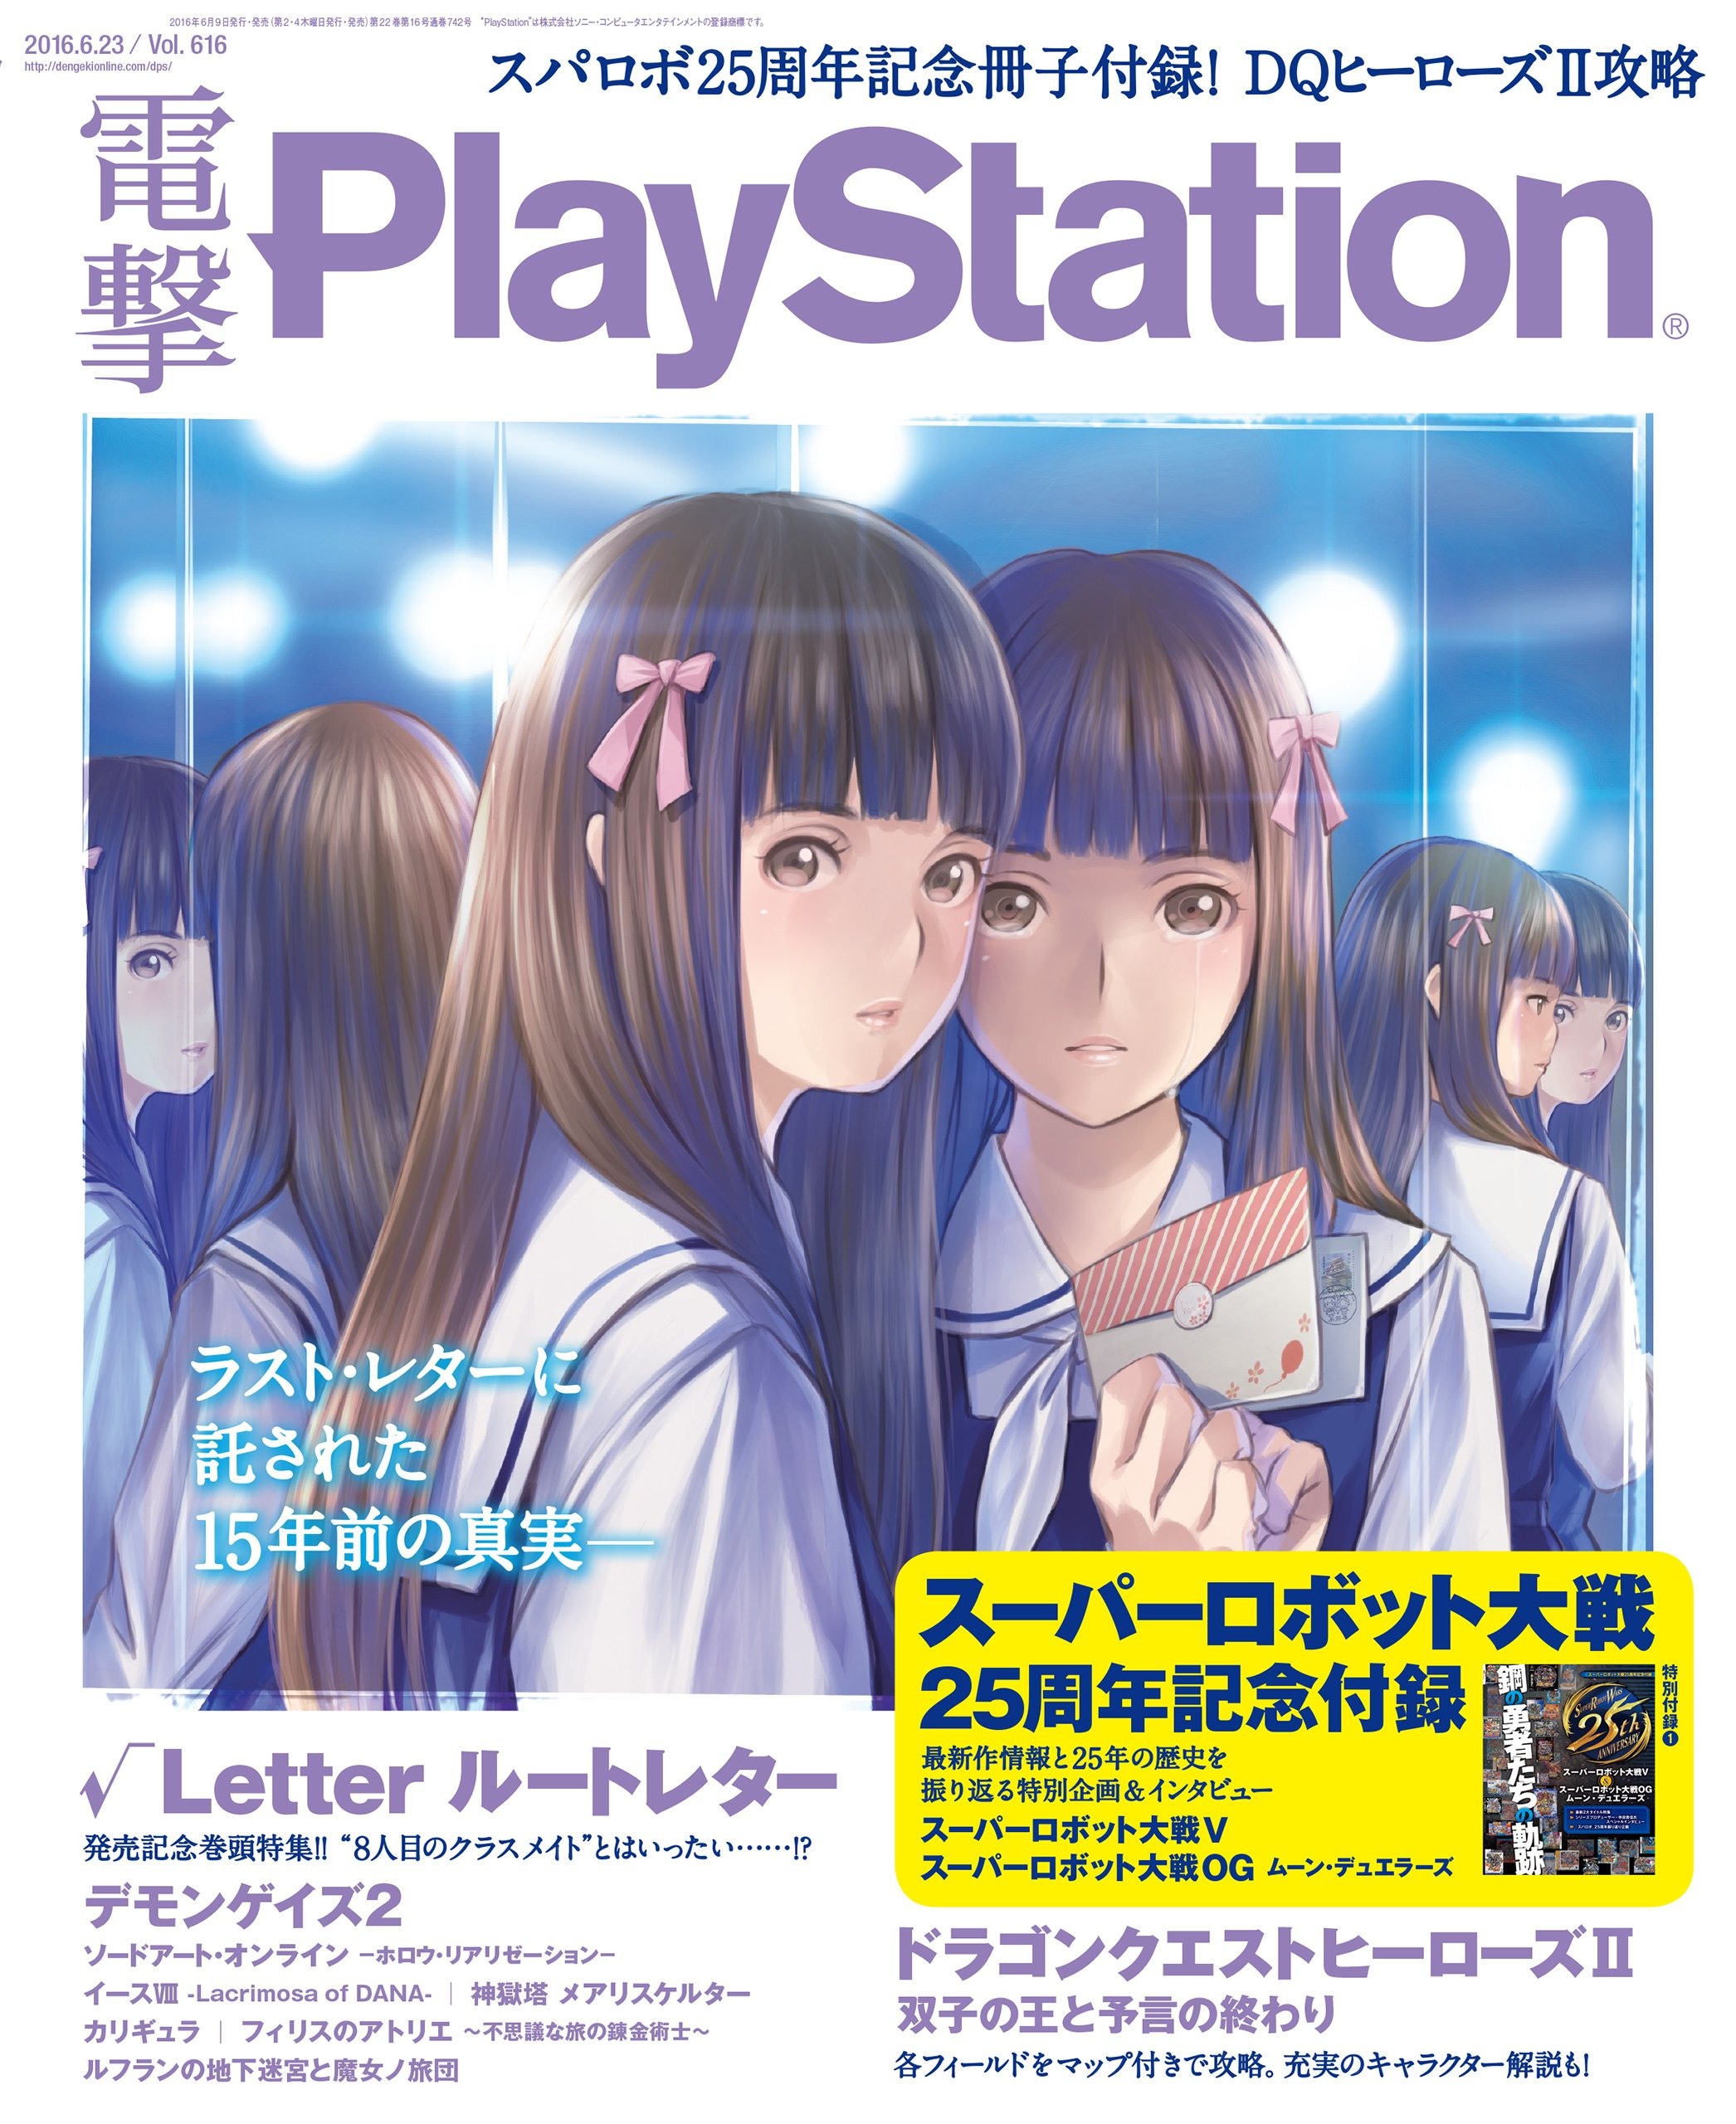 Dengeki PlayStation 616 (June 23, 2016)